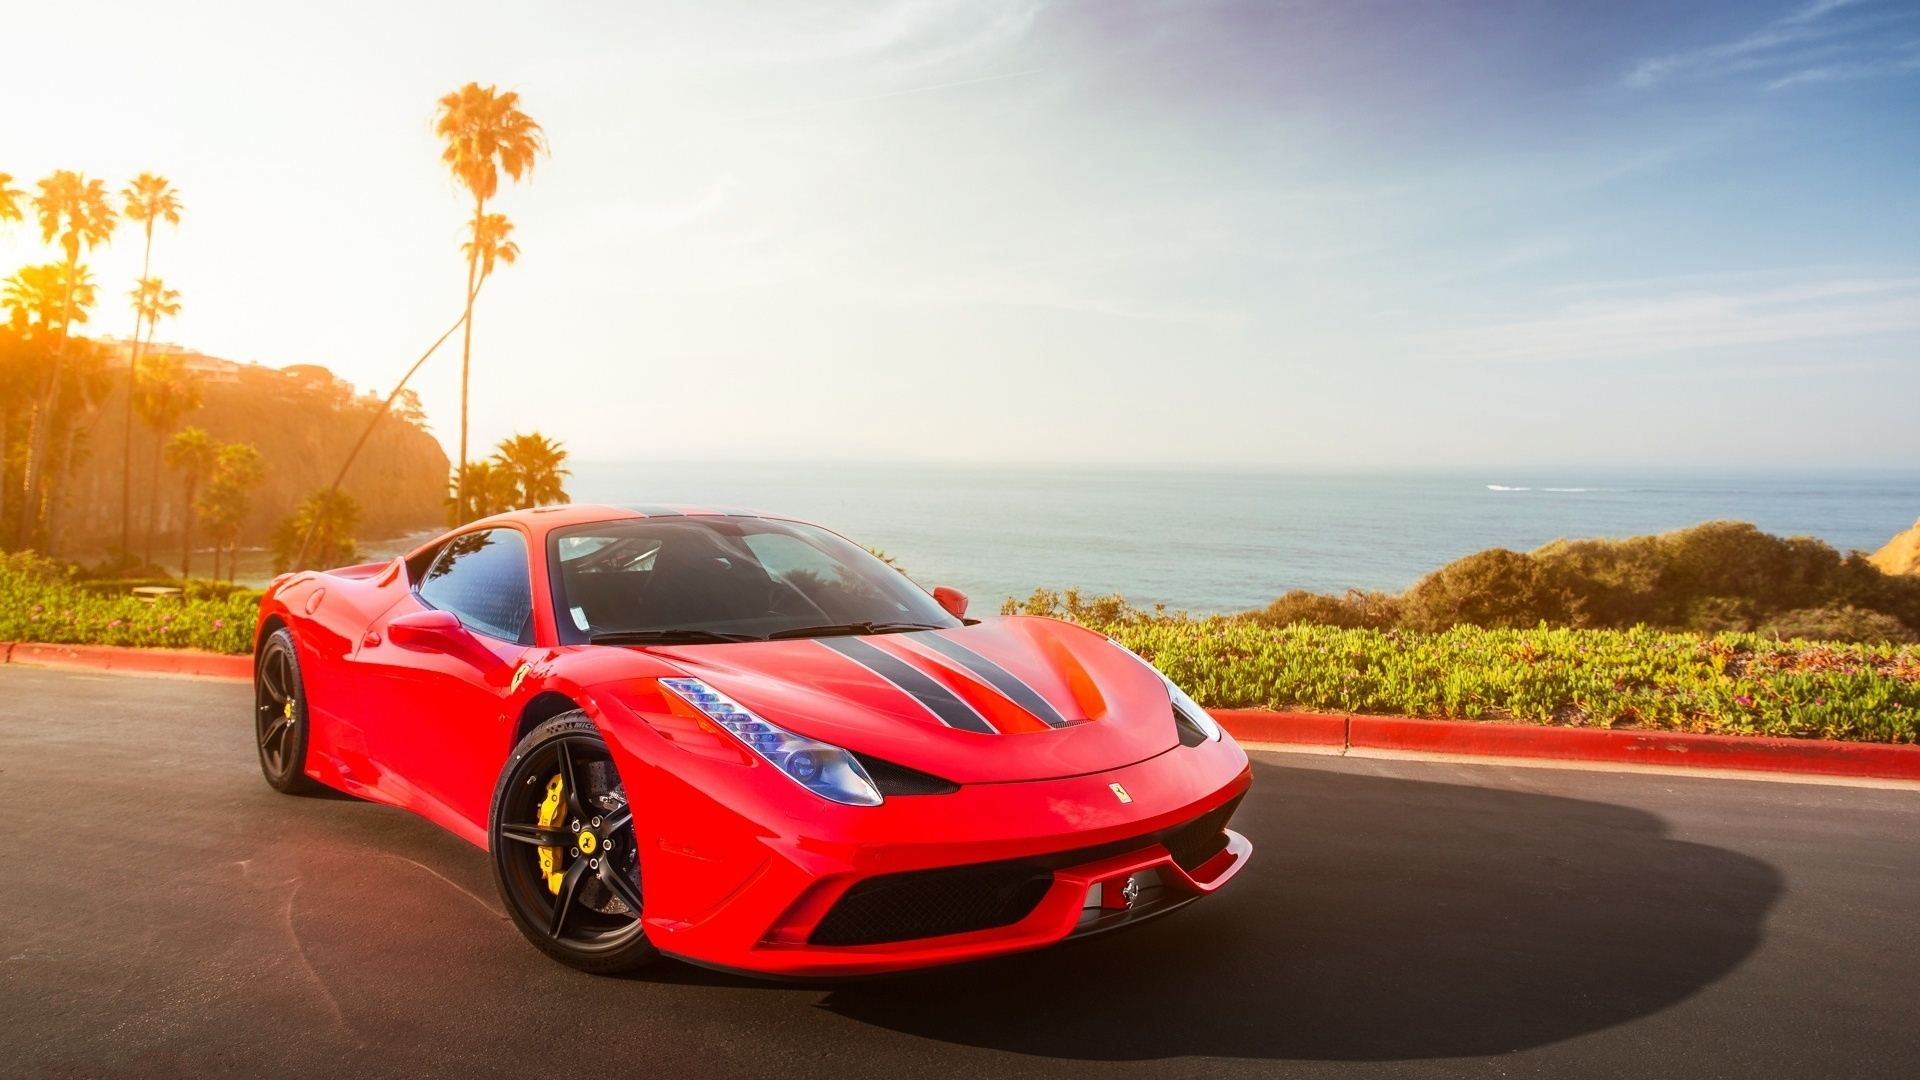 Best Looking Car Wallpaper Exotic Cars Imagine Lifestyle Luxury Rentals